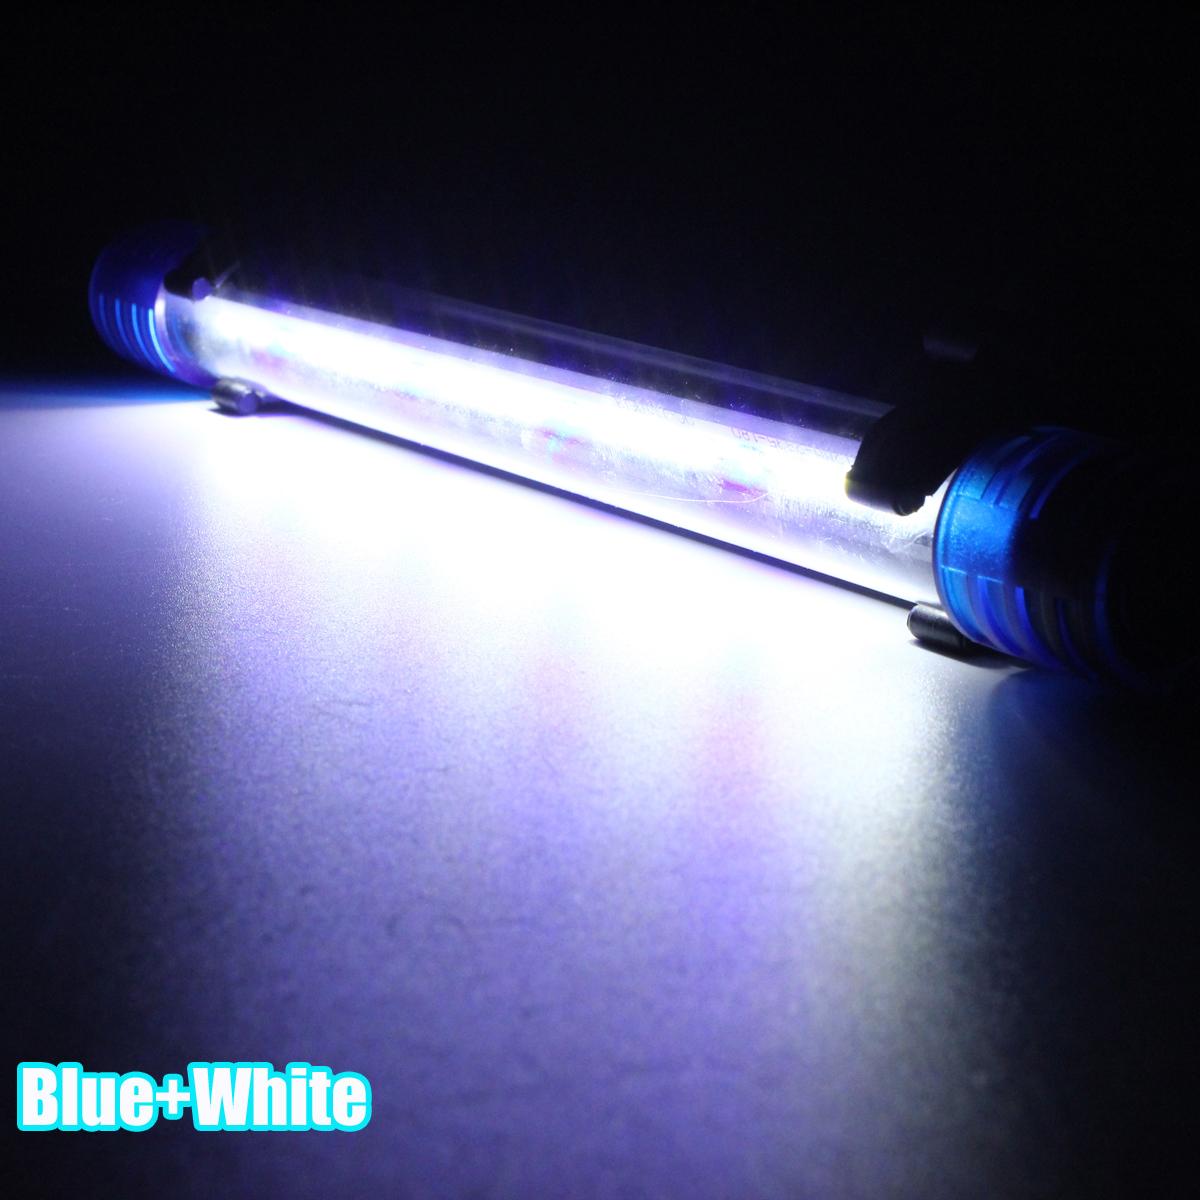 Aquarium waterproof led light bar fish tank submersible downlight b7d08382 8a05 495f 83c2 c695790f210eg aloadofball Gallery